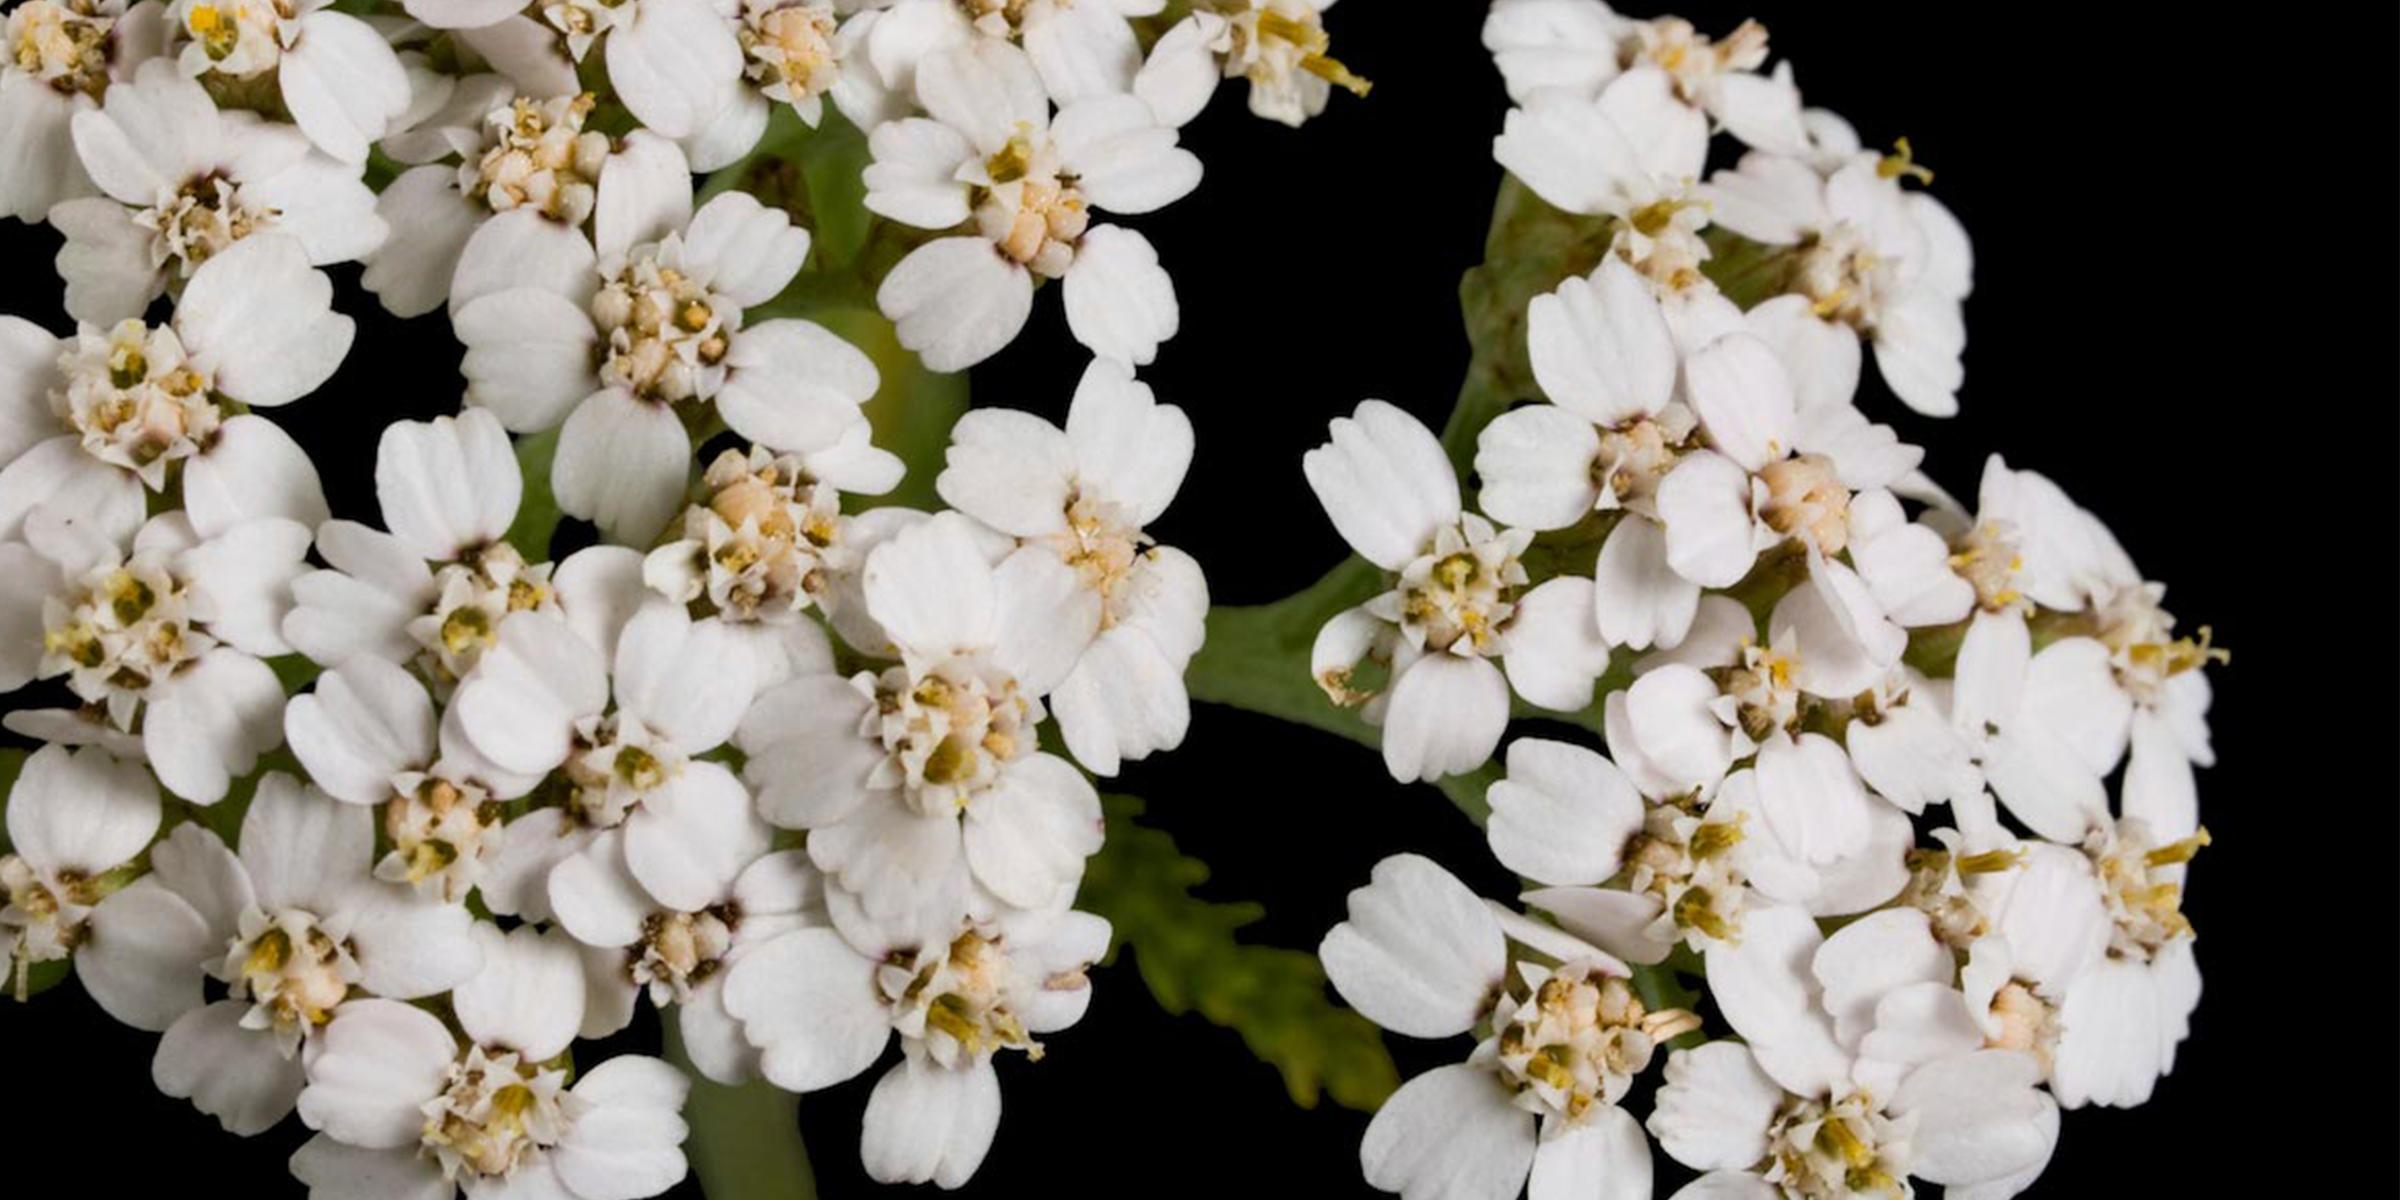 Hummingbird Blossom: medicinal plants the native used